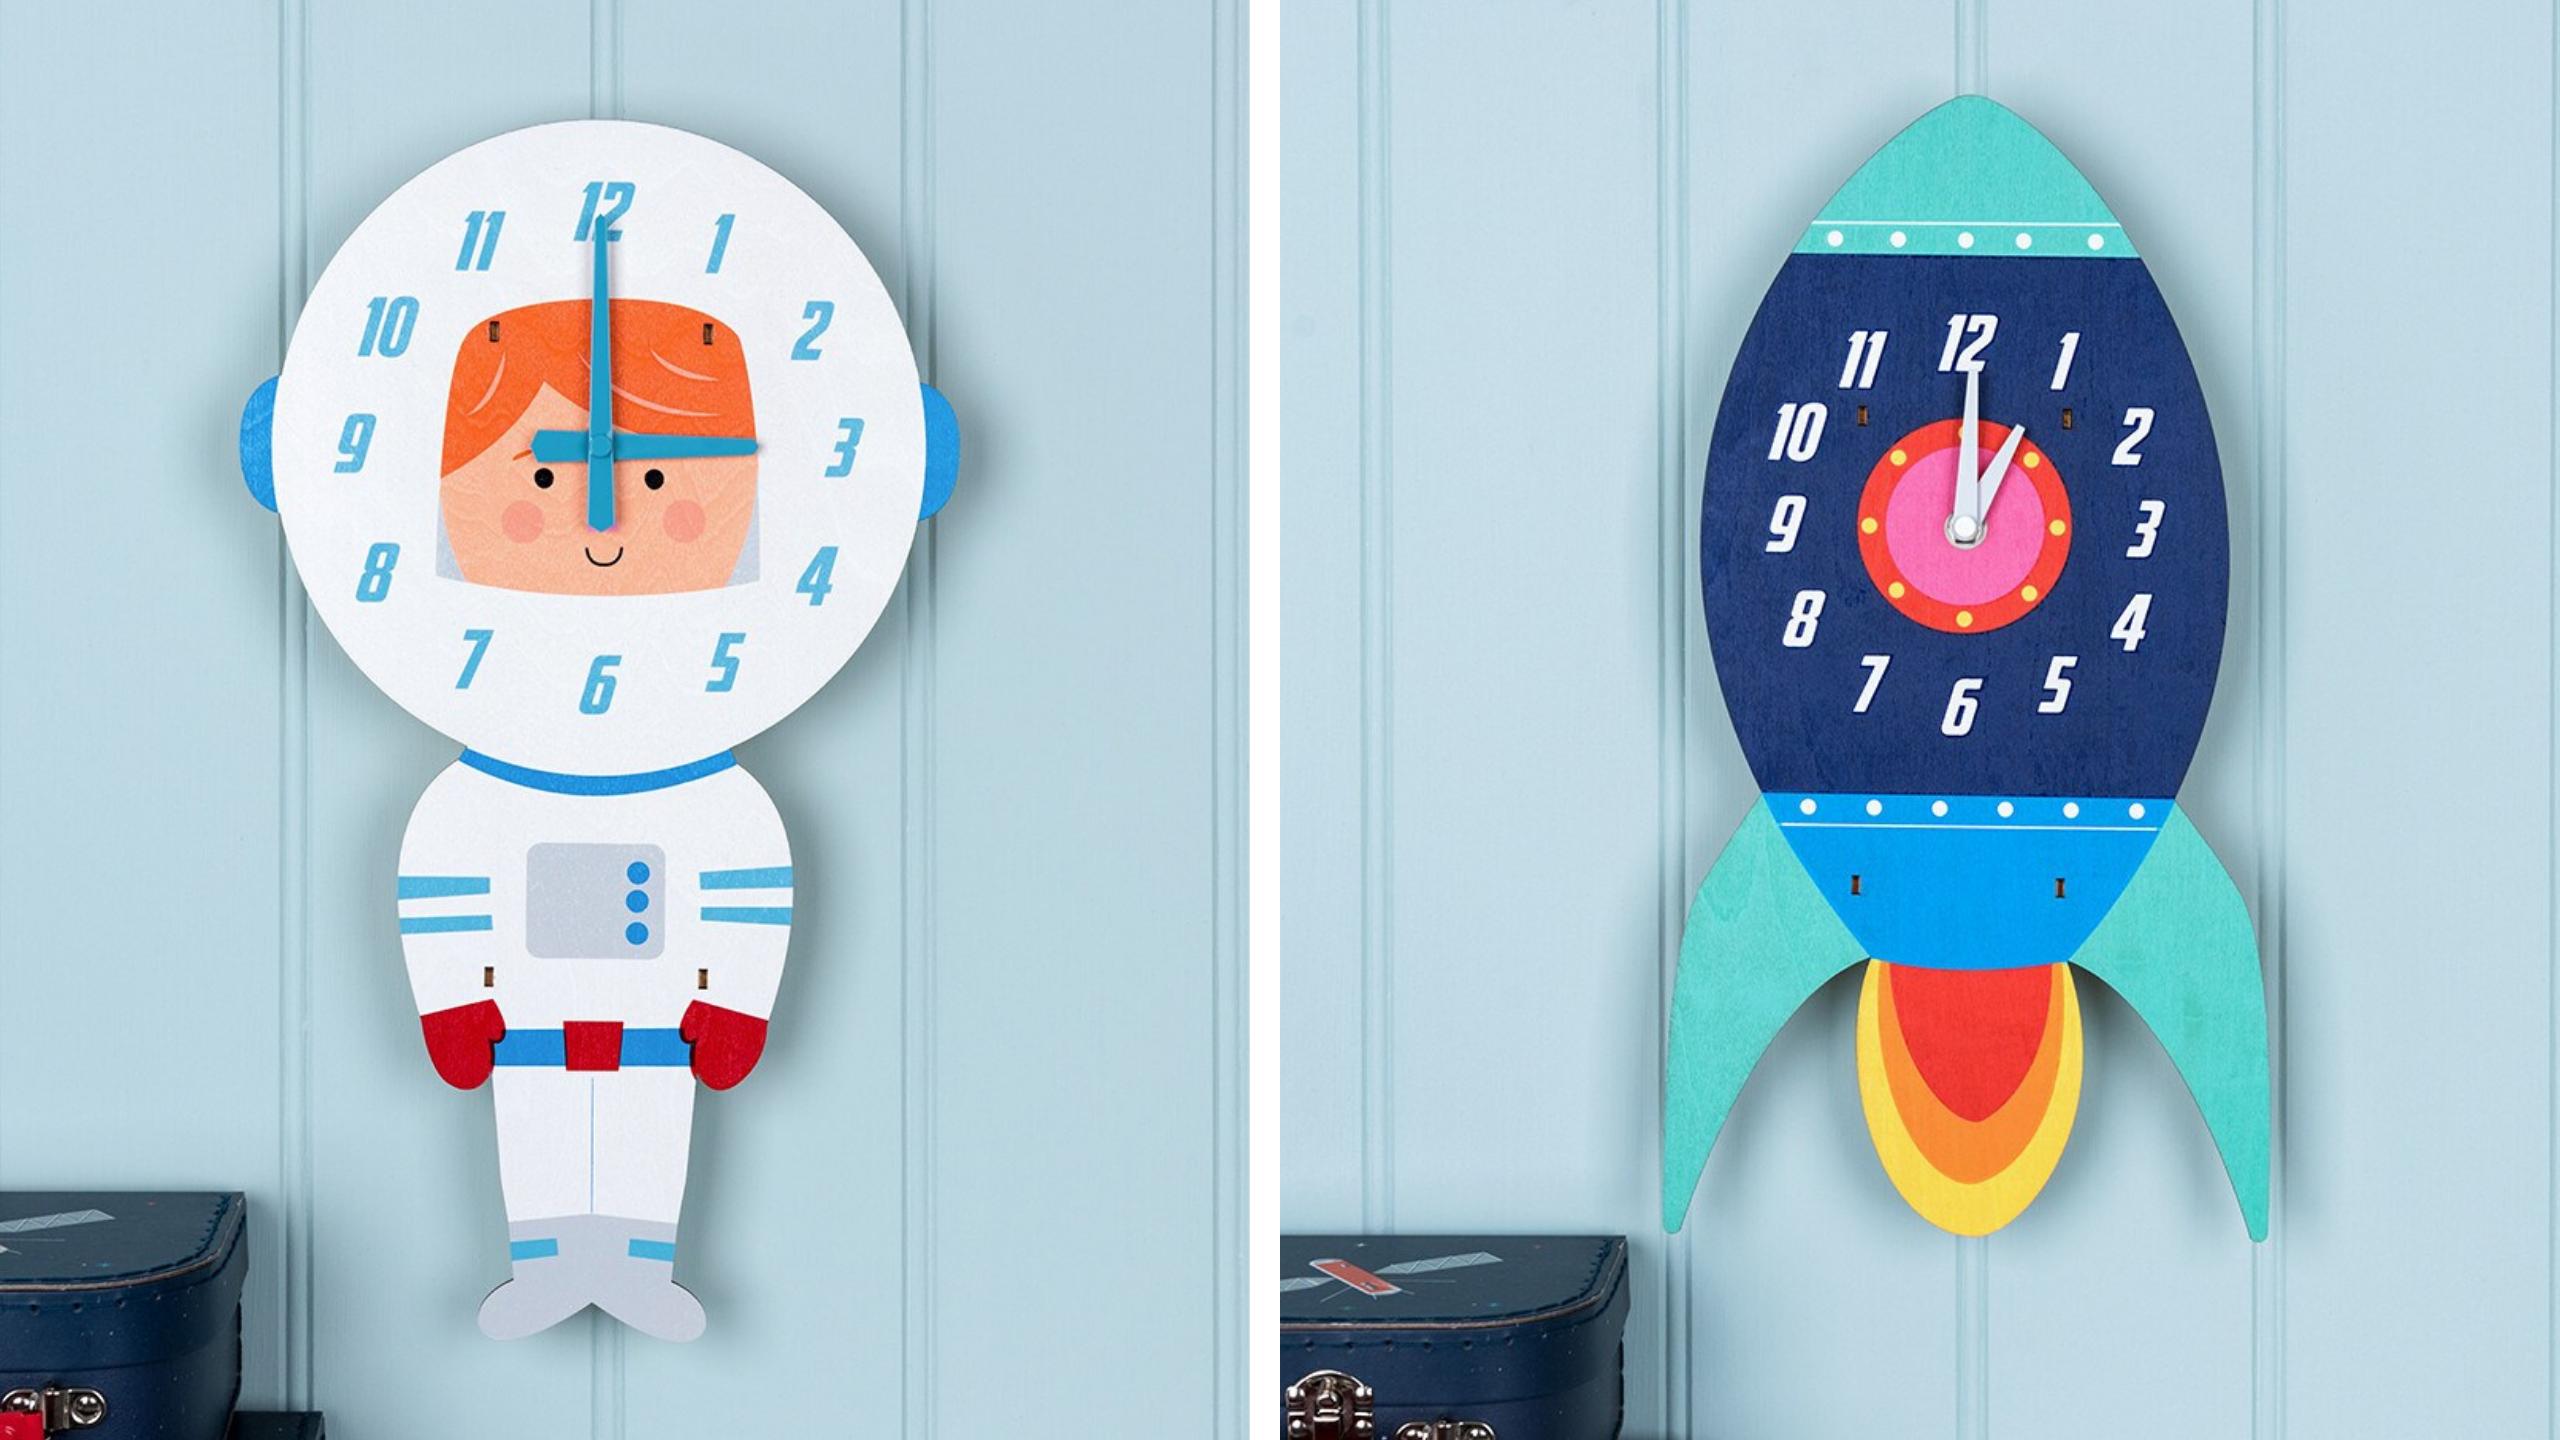 space bedroom-wall-clocks